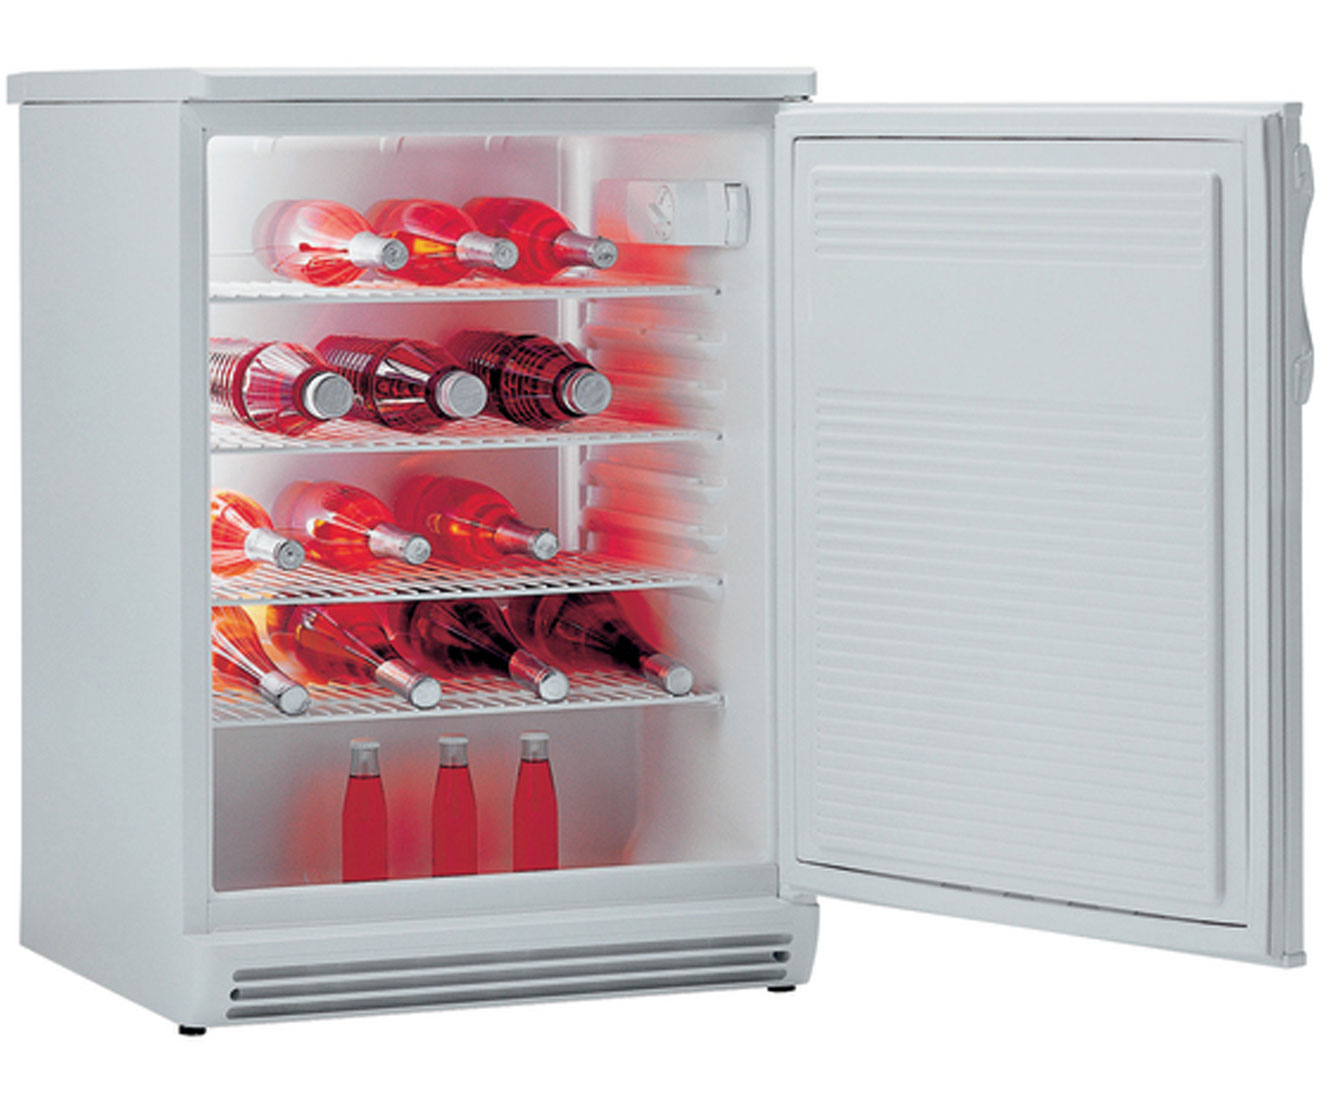 Gorenje Kühlschrank Erfahrungen : Gorenje rvc 6169 w kühlschrank weiß a